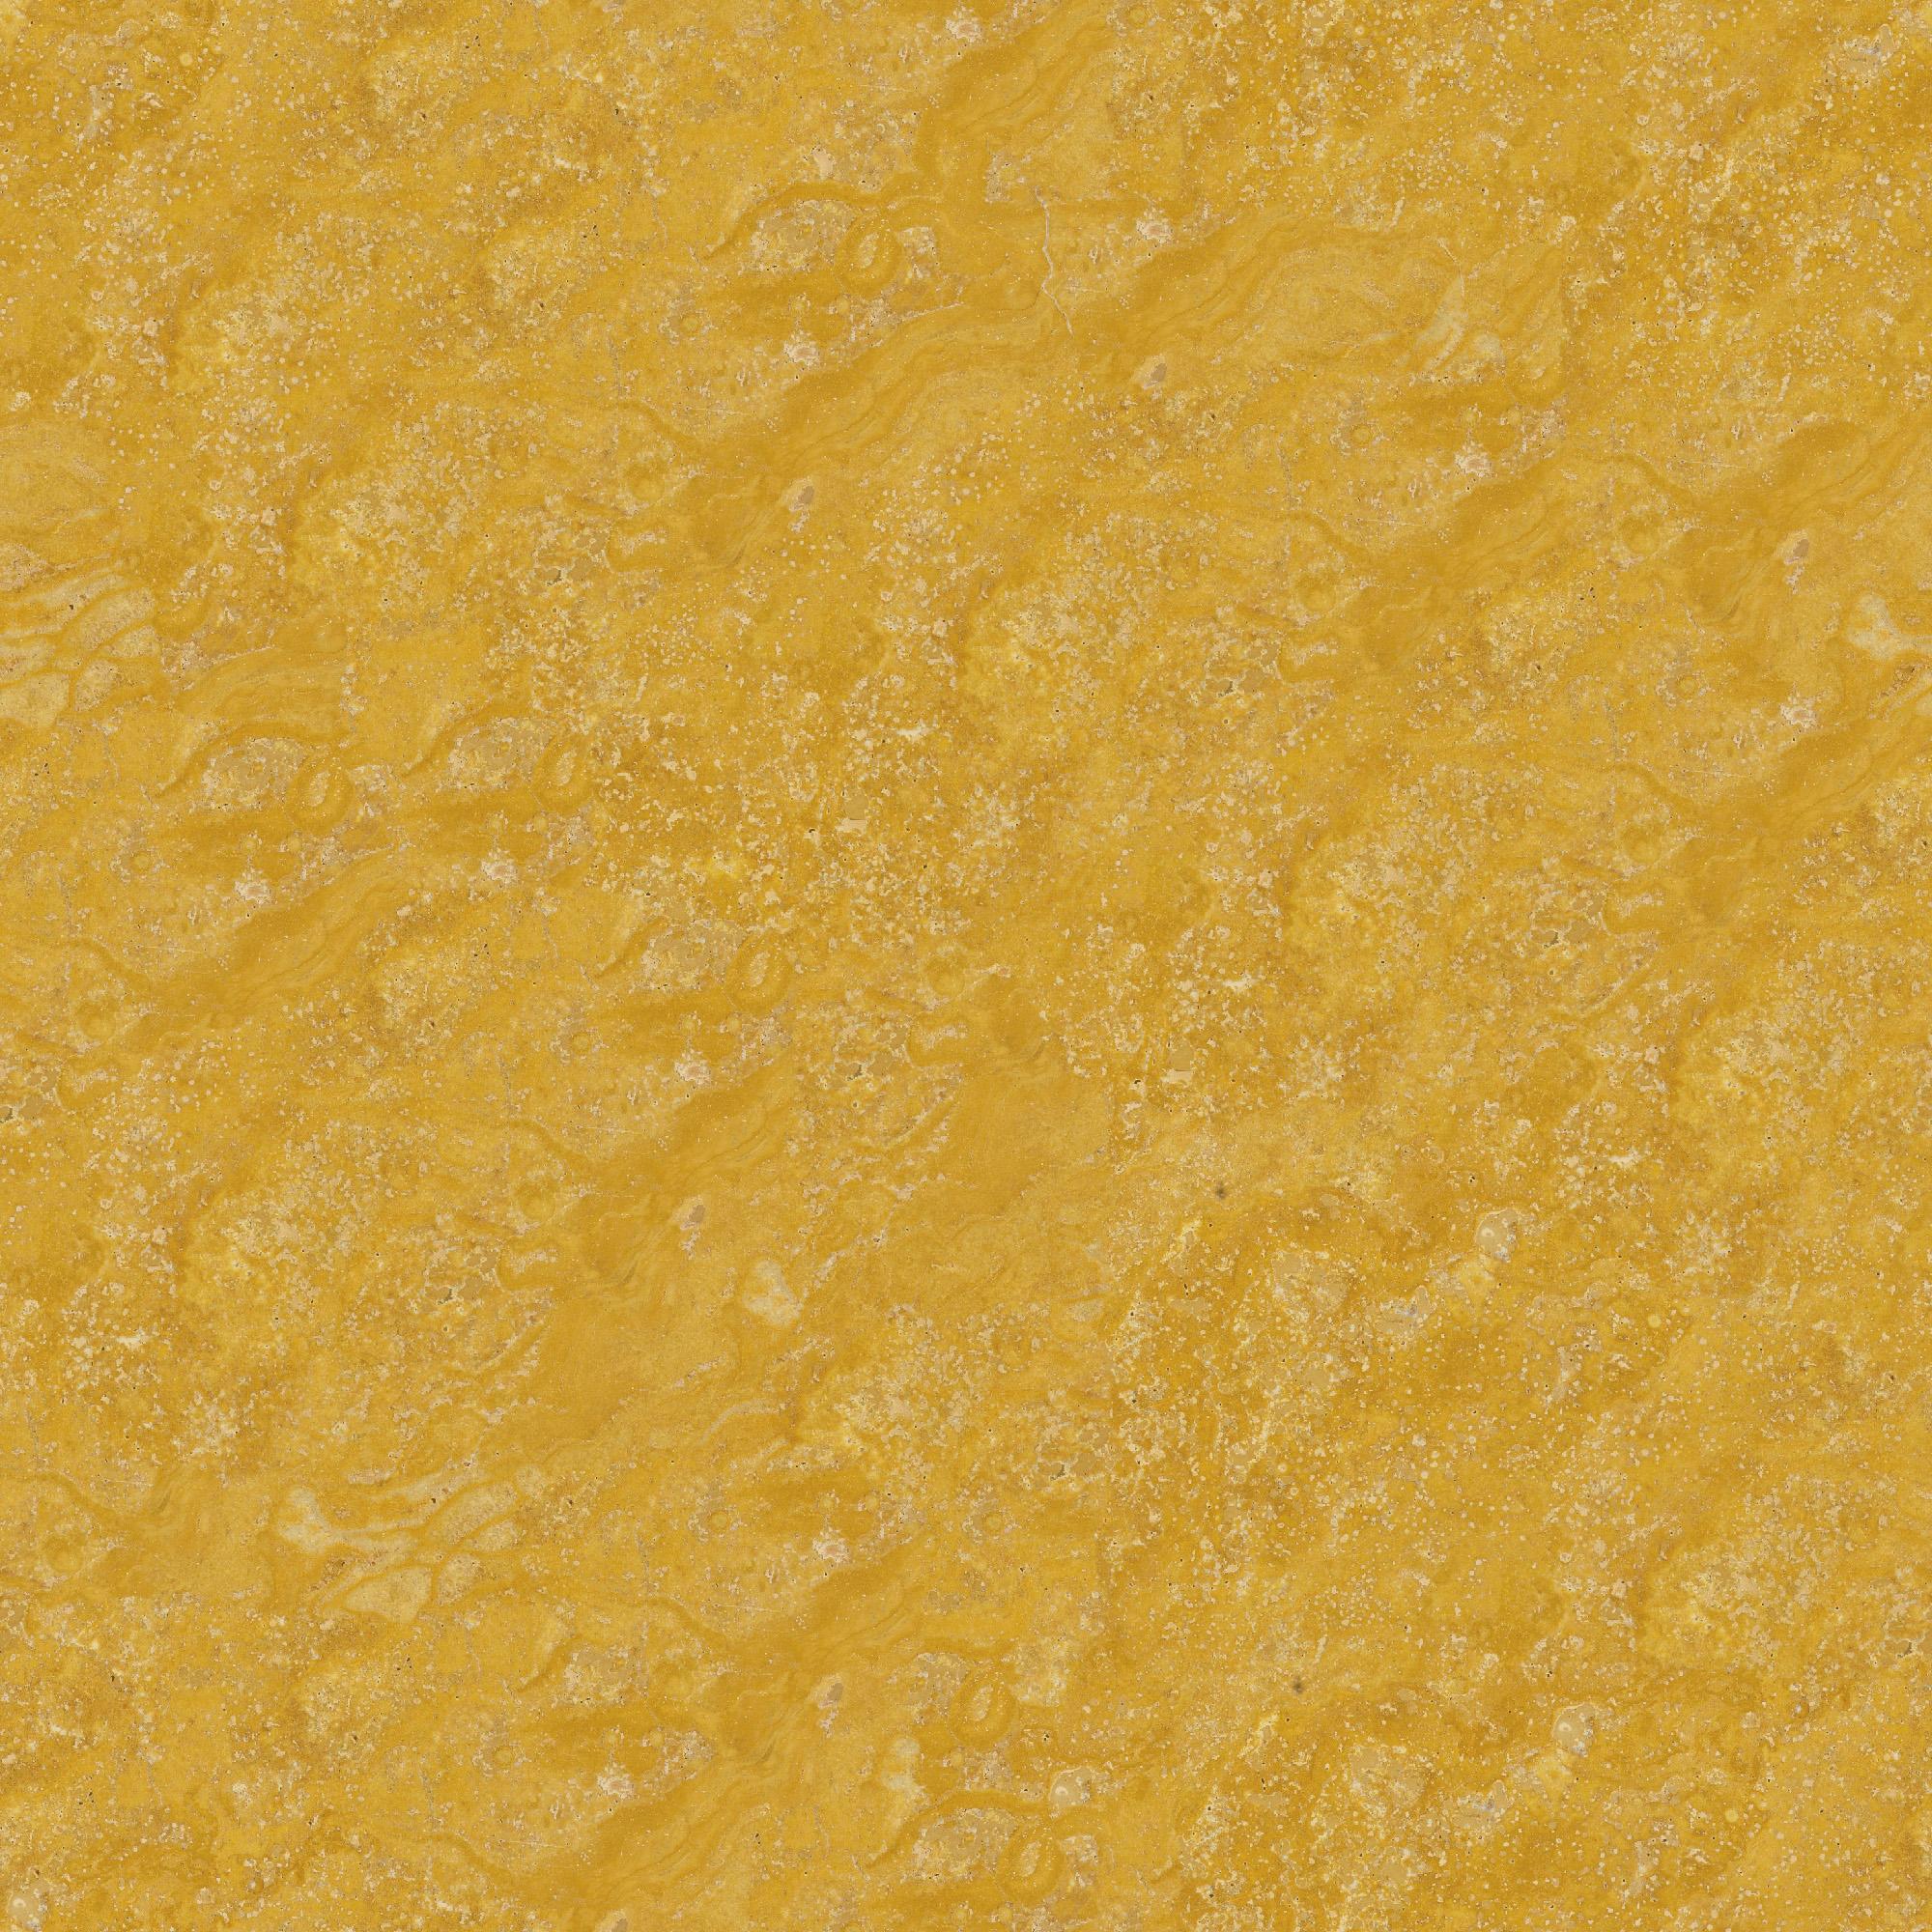 travertino giallo al verso.jpg